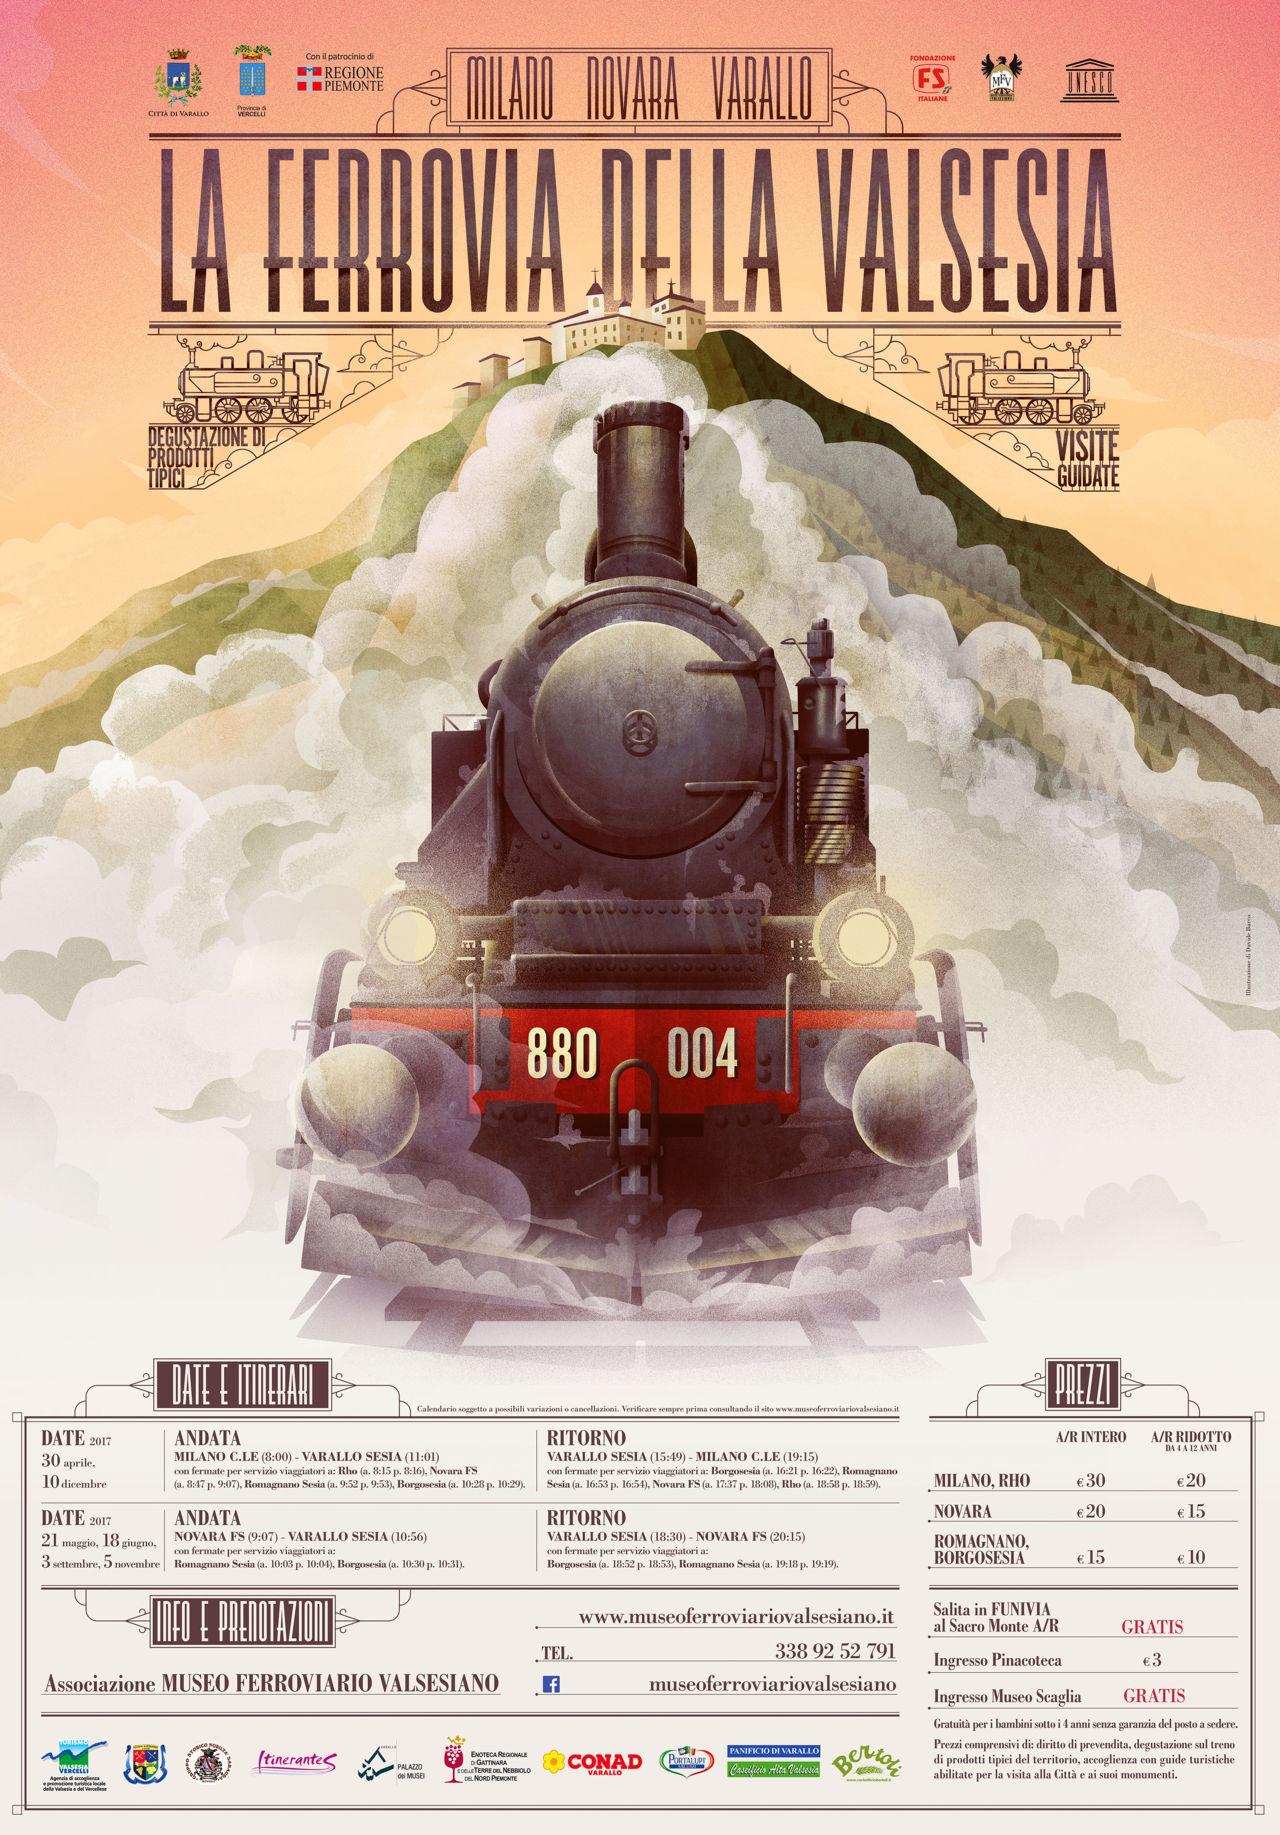 Ferrovia della Valsesia